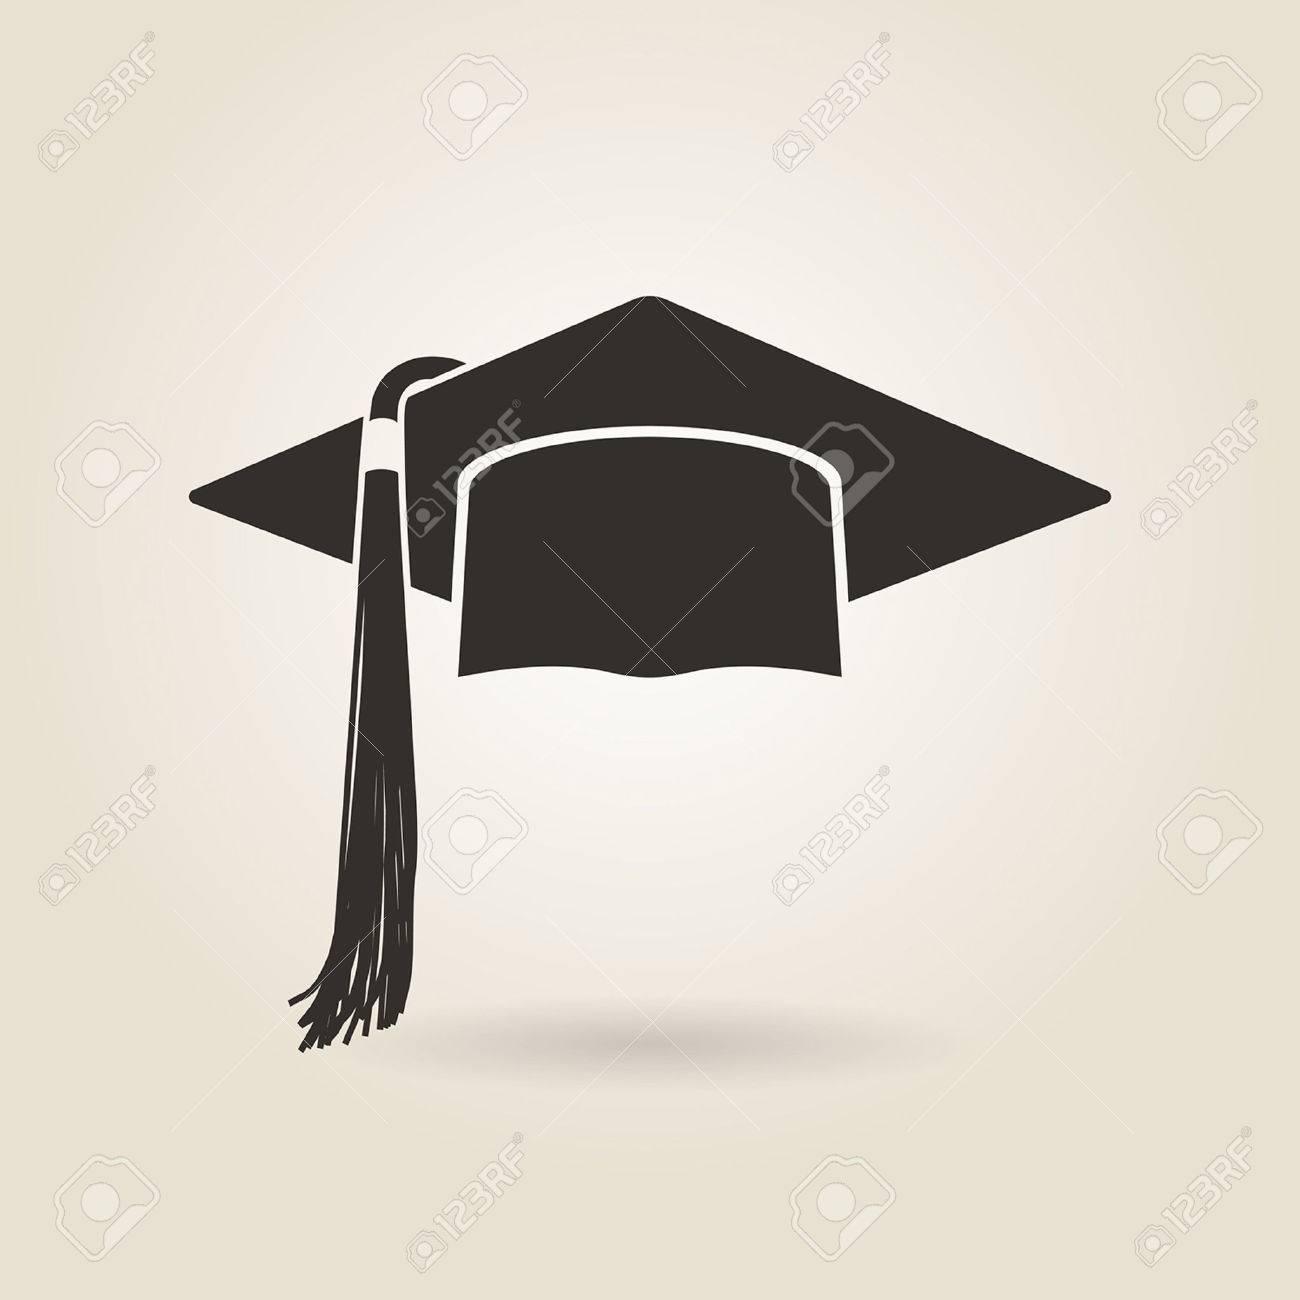 graduate cap icon on a light background - 35803021